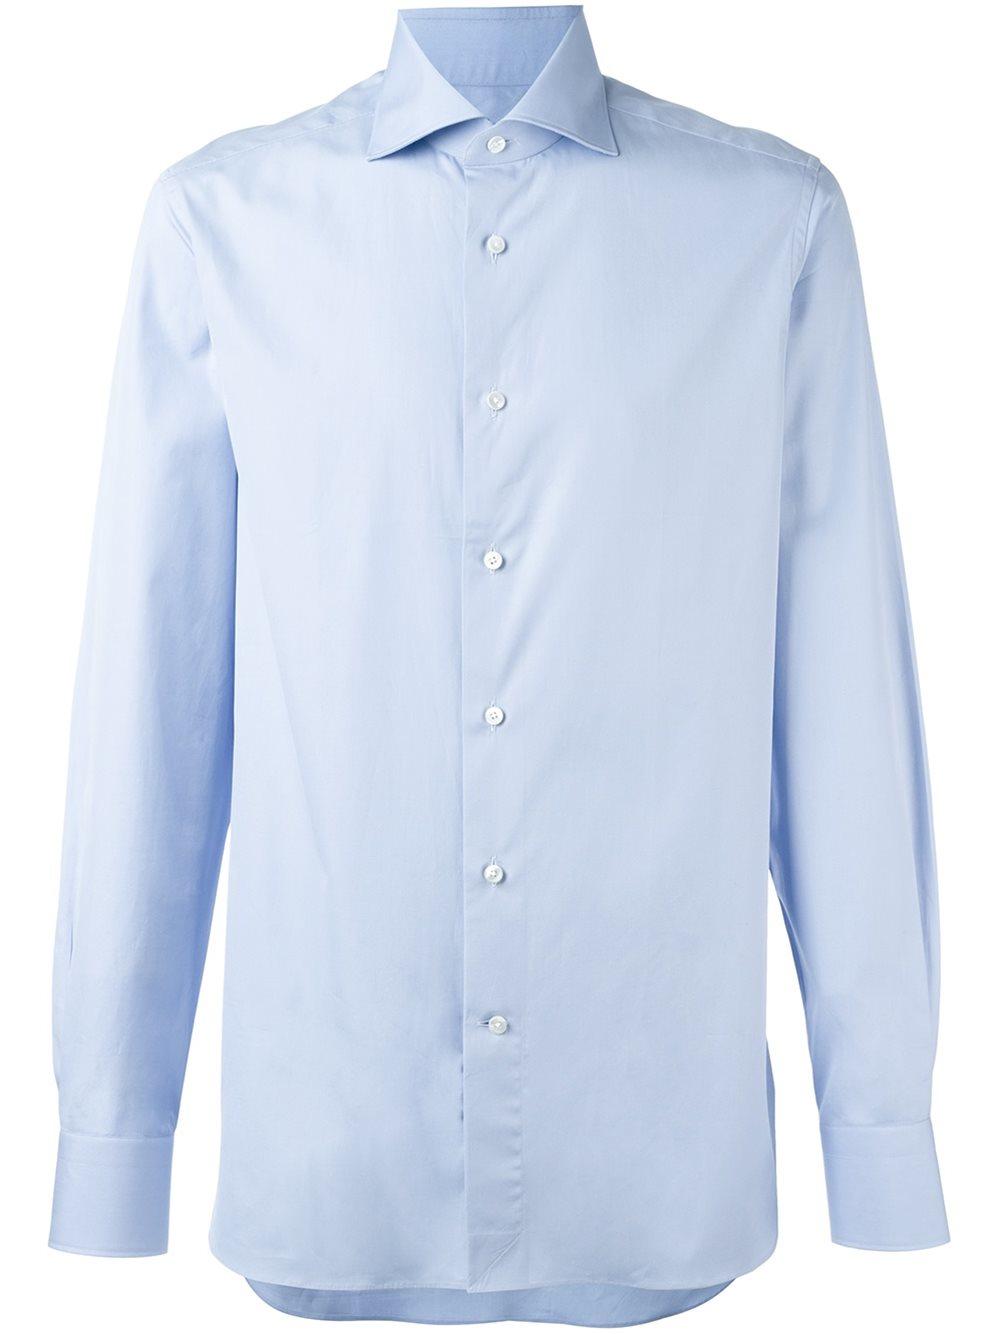 ermenegildo zegna classic shirt in blue for men lyst. Black Bedroom Furniture Sets. Home Design Ideas